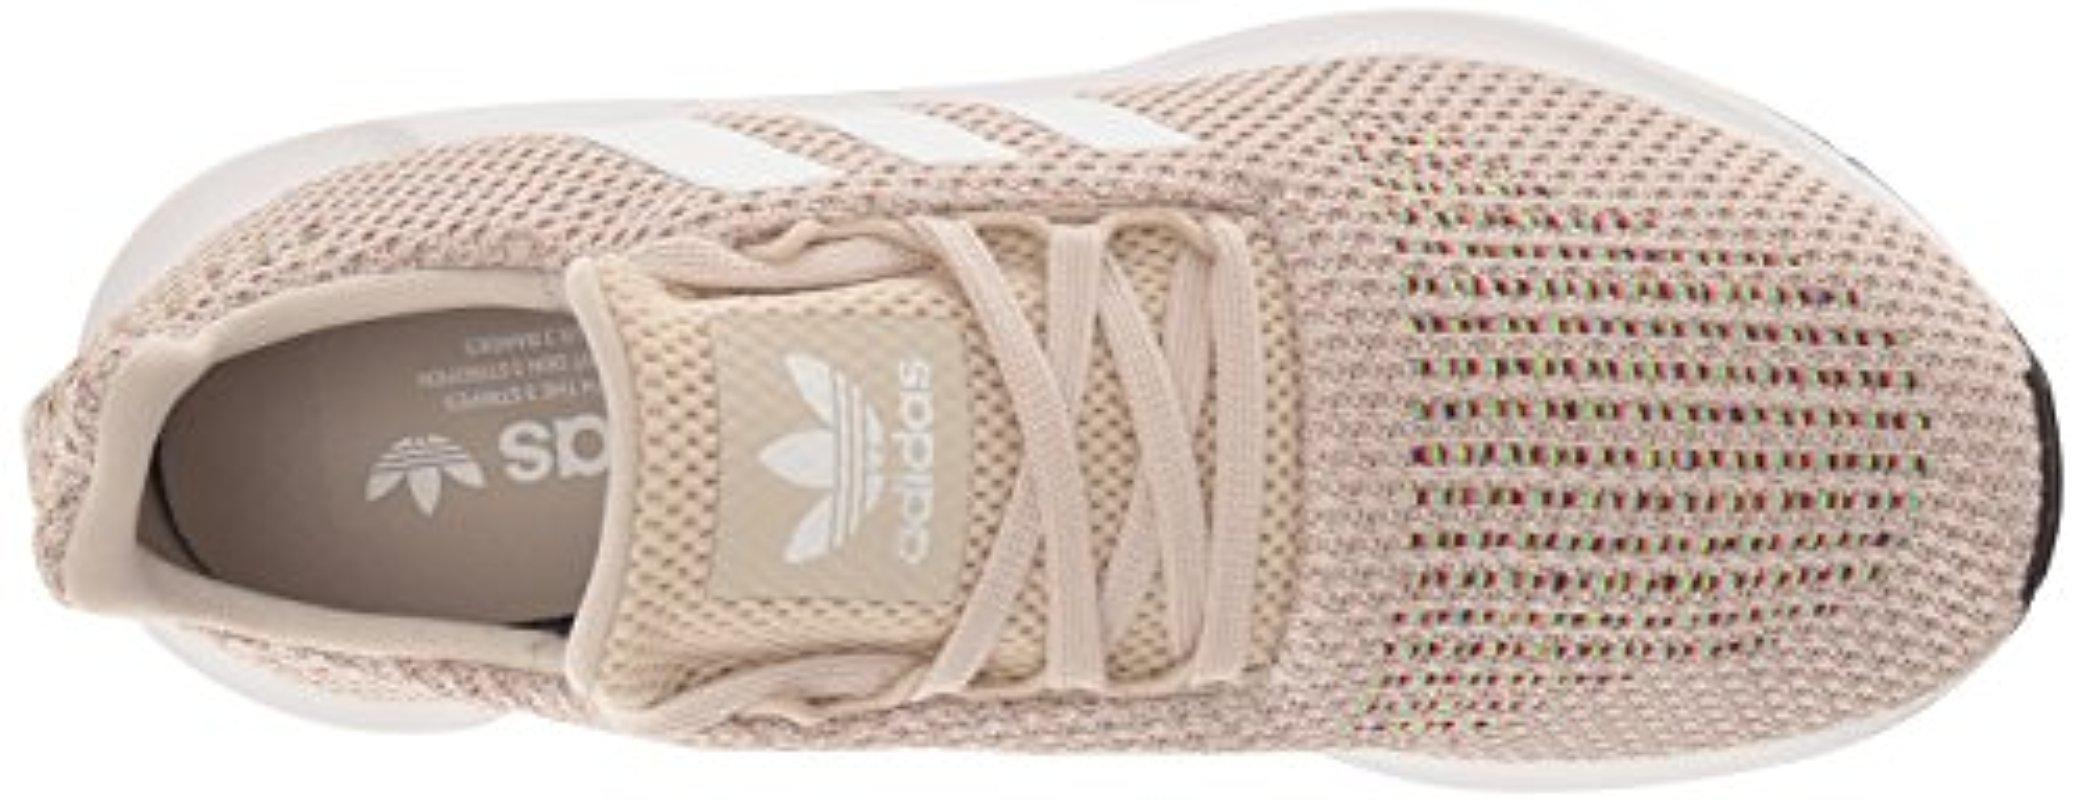 cbc16e37374 Lyst - adidas Originals Swift W Running-shoes